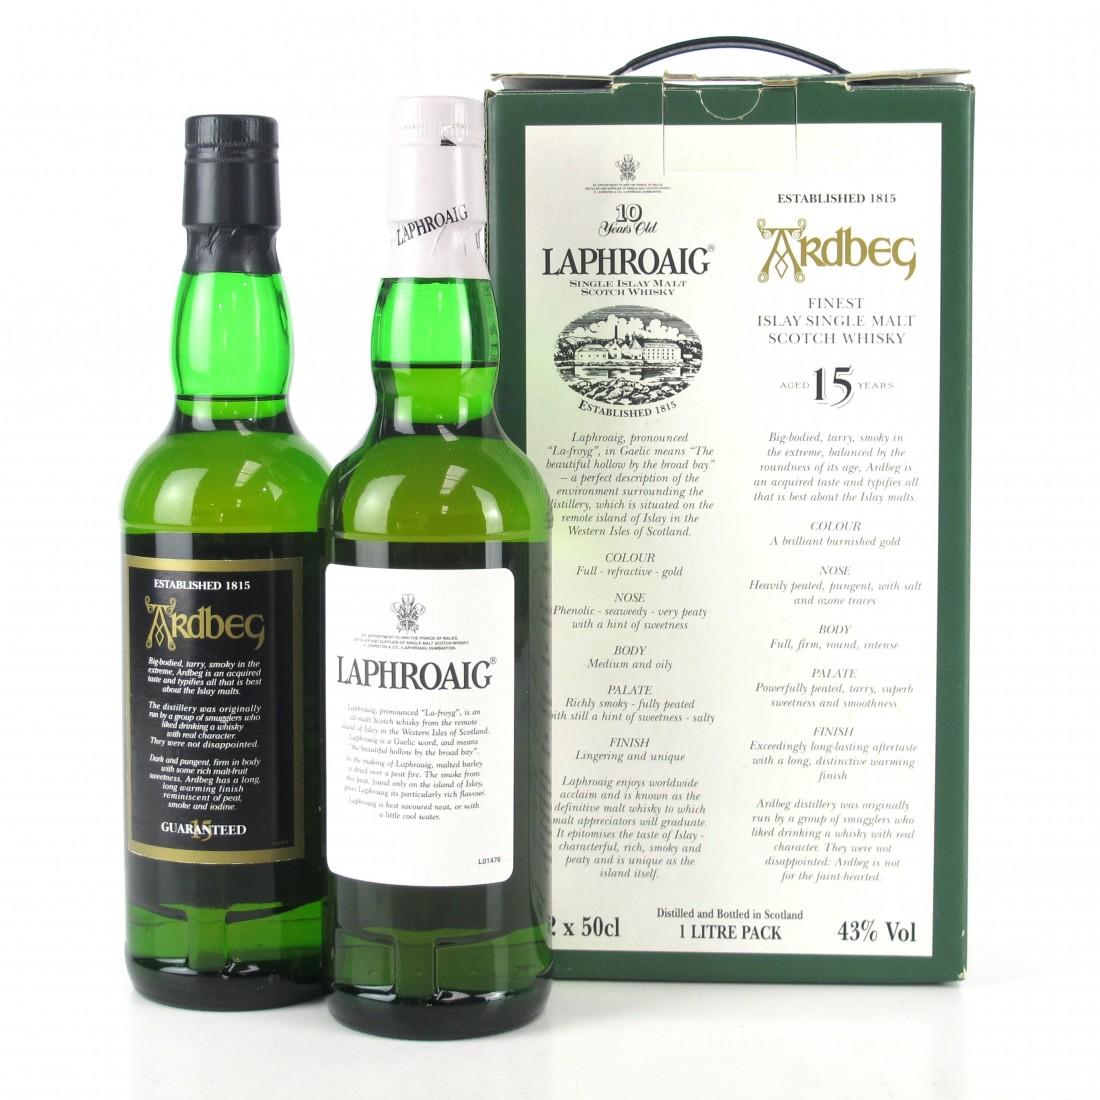 Quintessential Islay / Laphroaig 10 Year Old 50cl & Ardbeg 15 Year Old 50cl